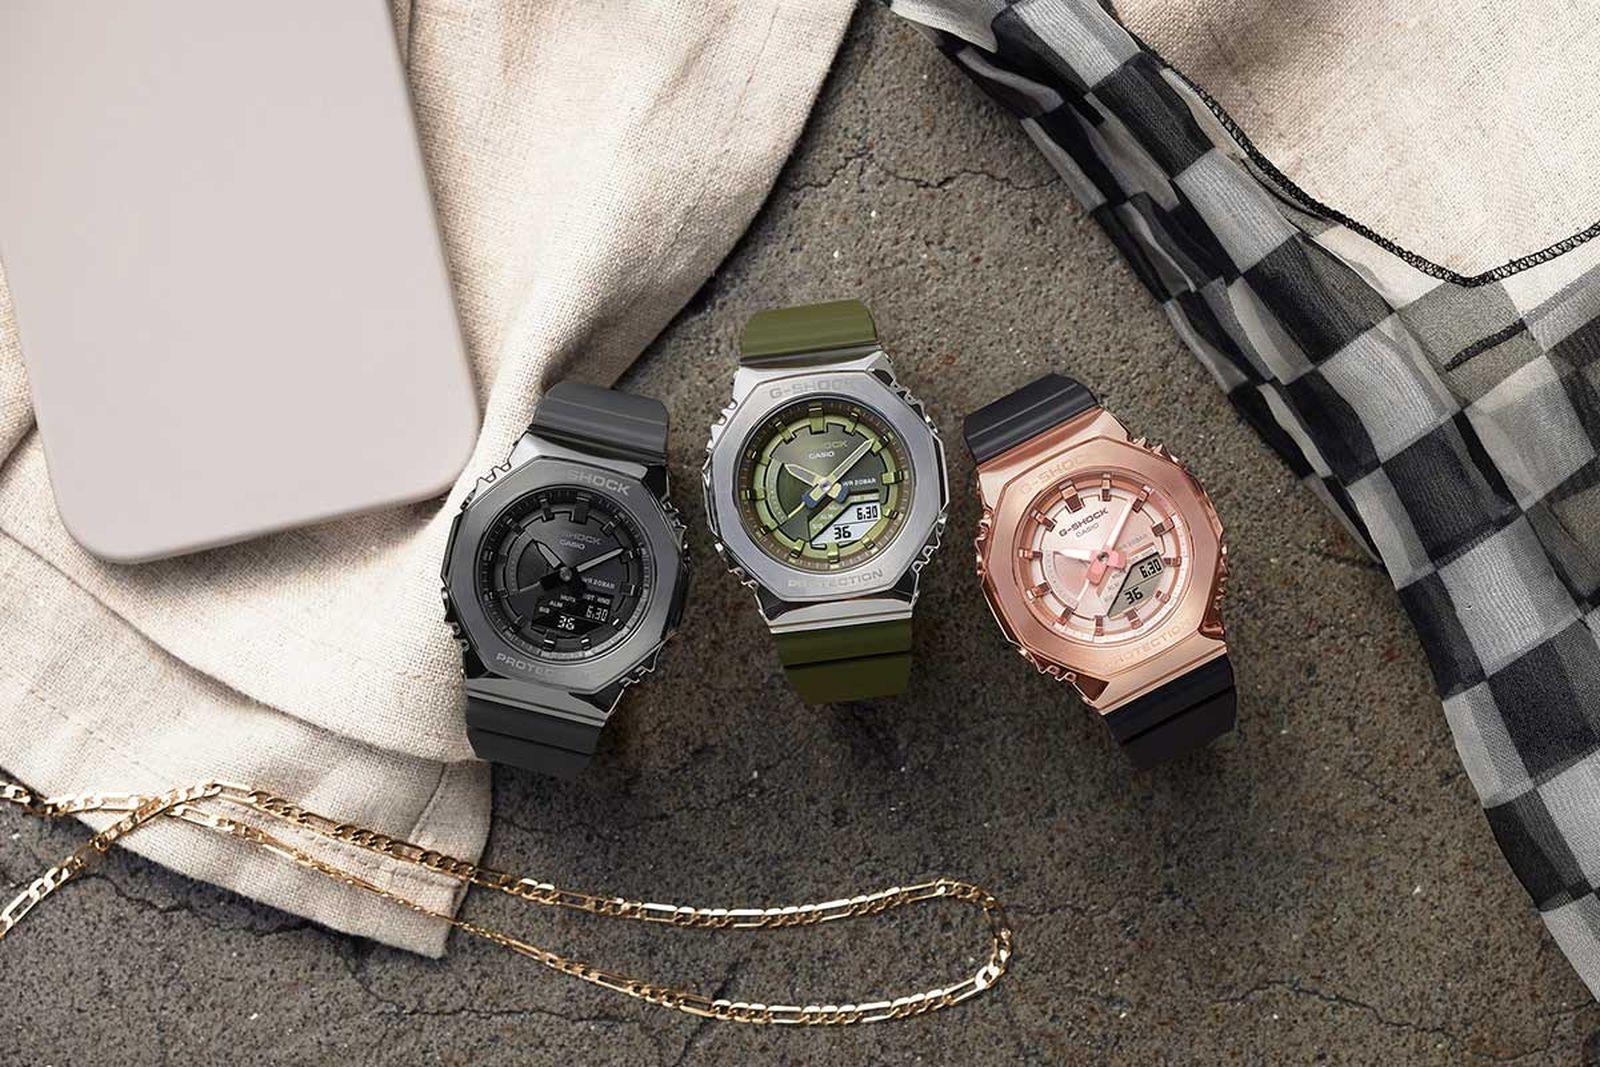 casio g-shock gm-2100 metal watch collection release date info price casioak